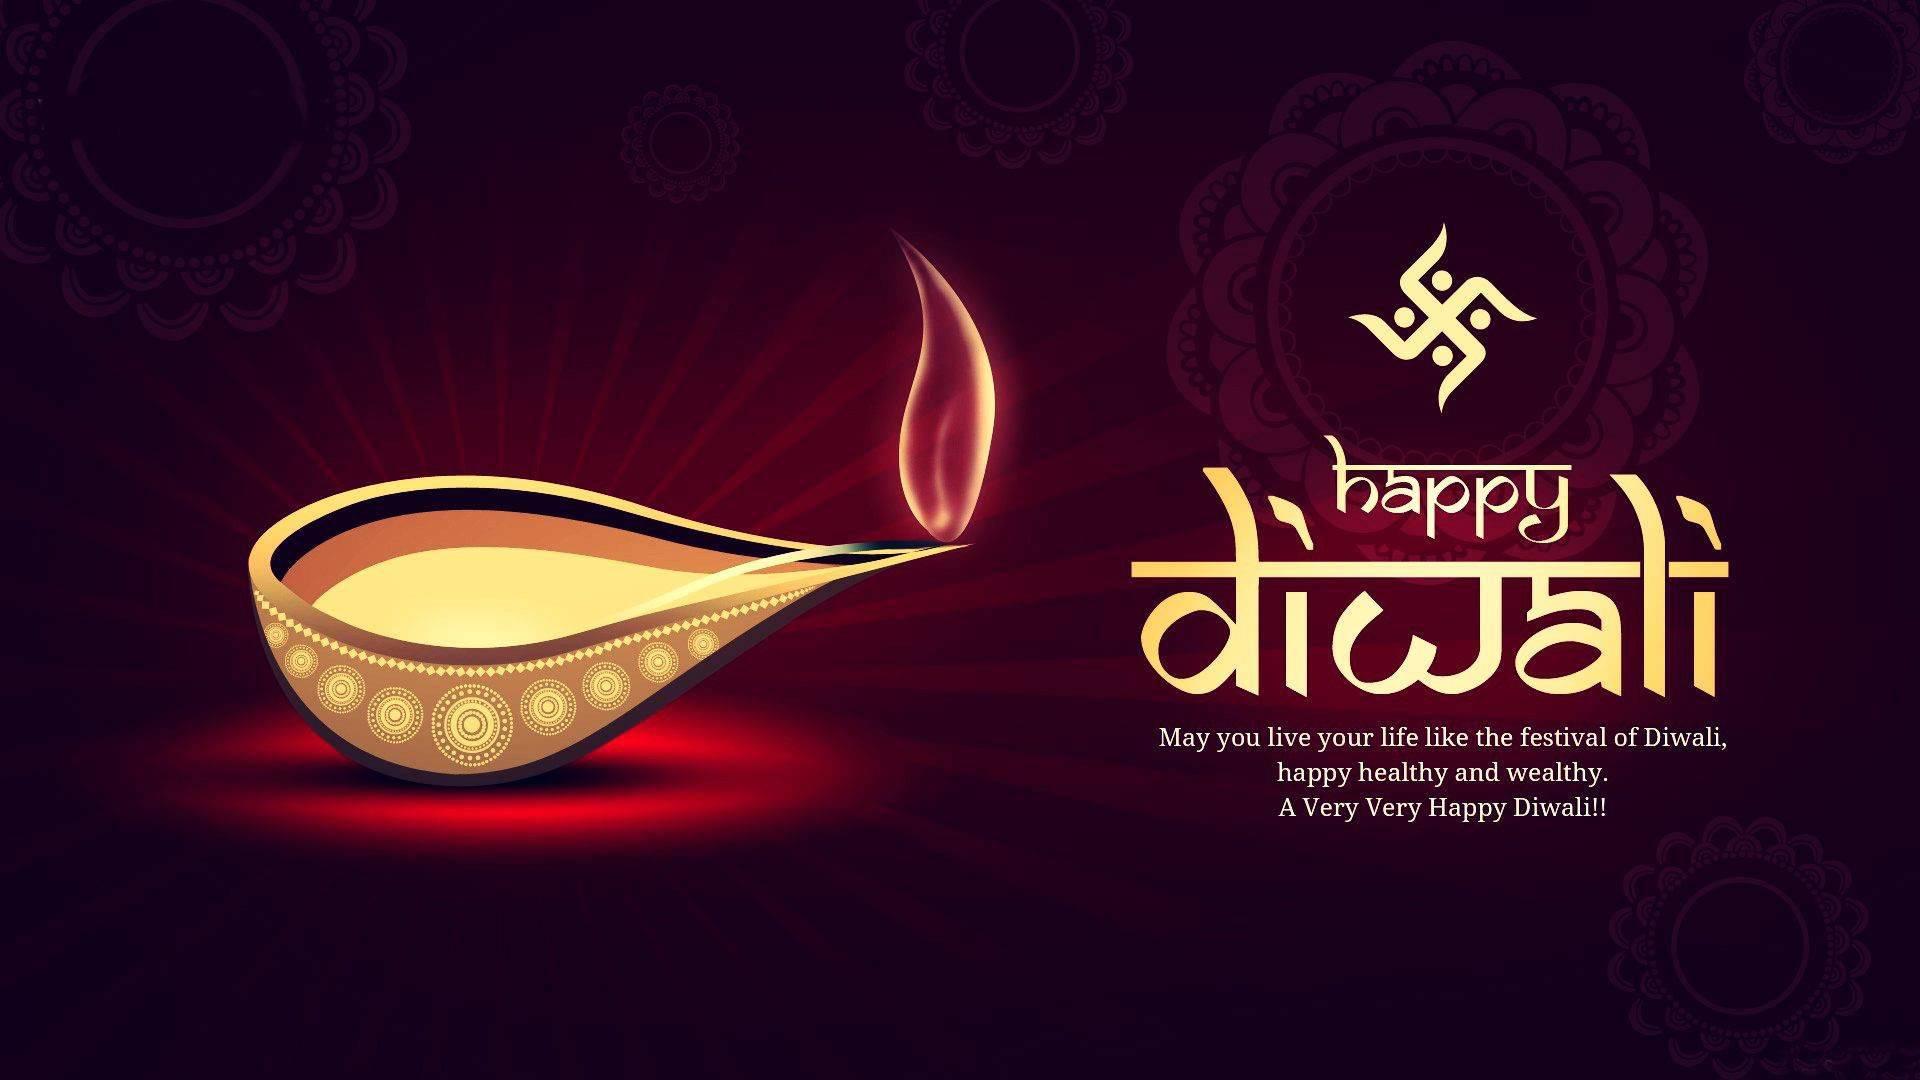 happy diwali wallpapers mega collection hd